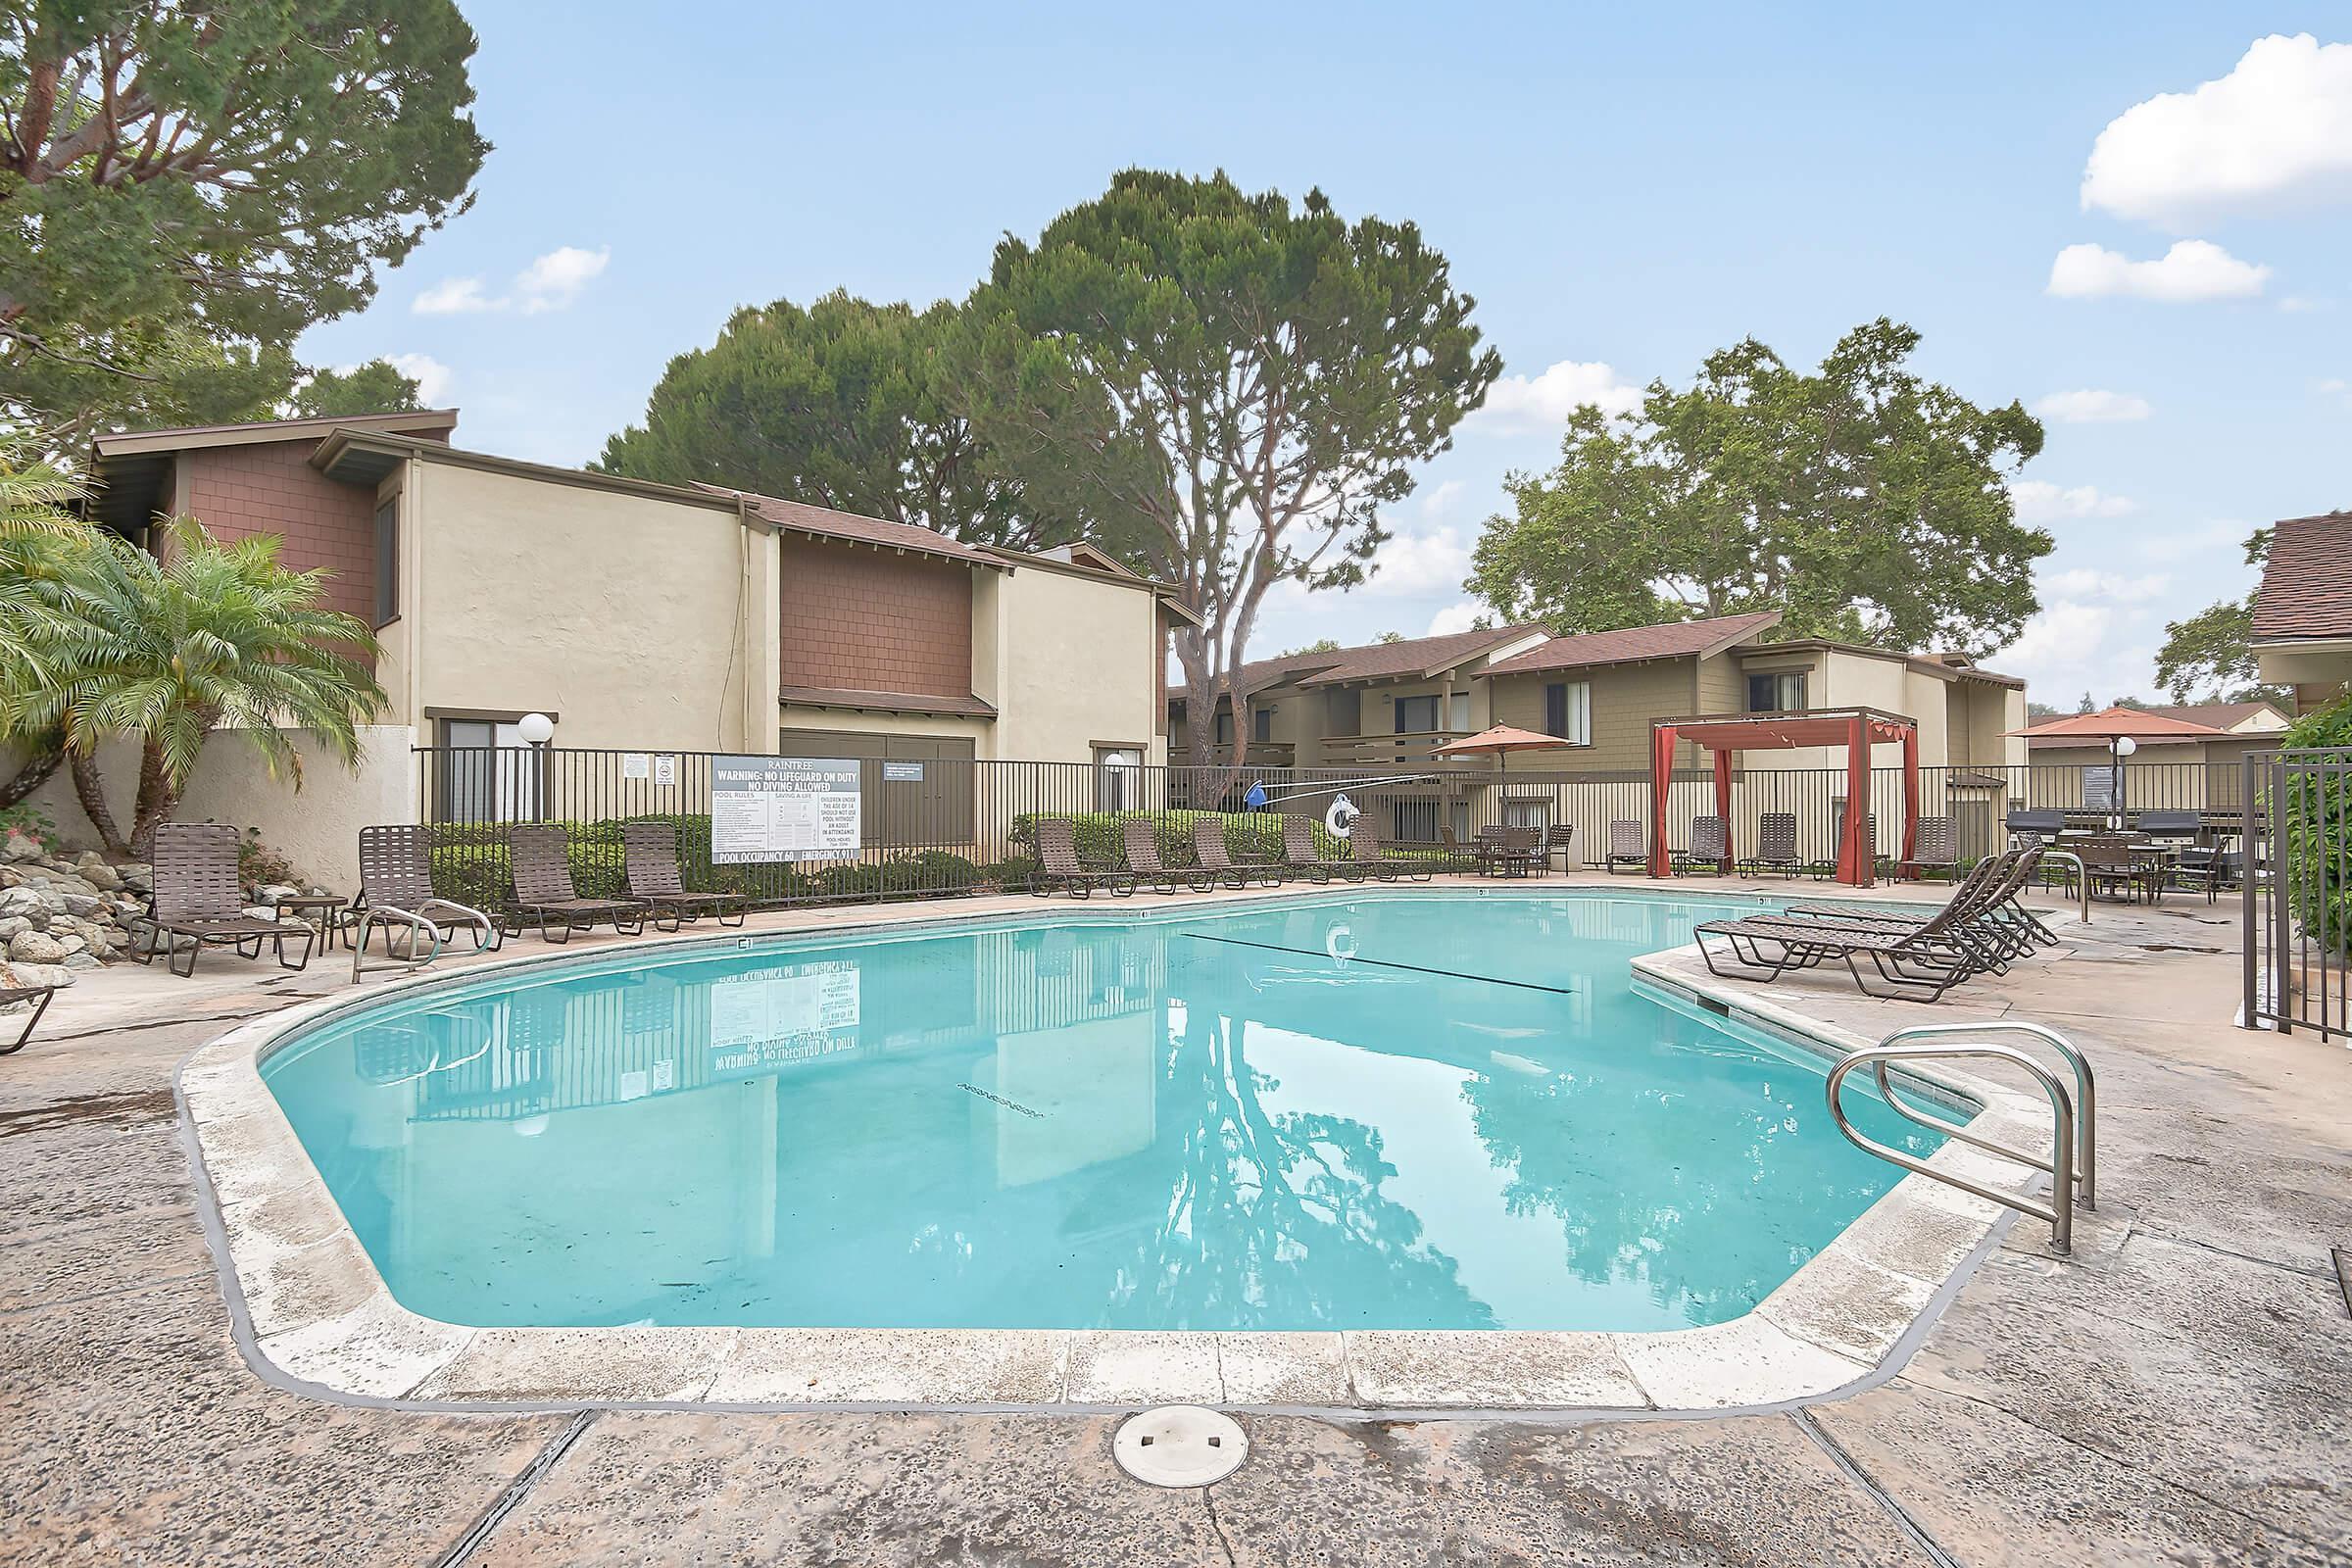 Raintree Apartment Homes community pool